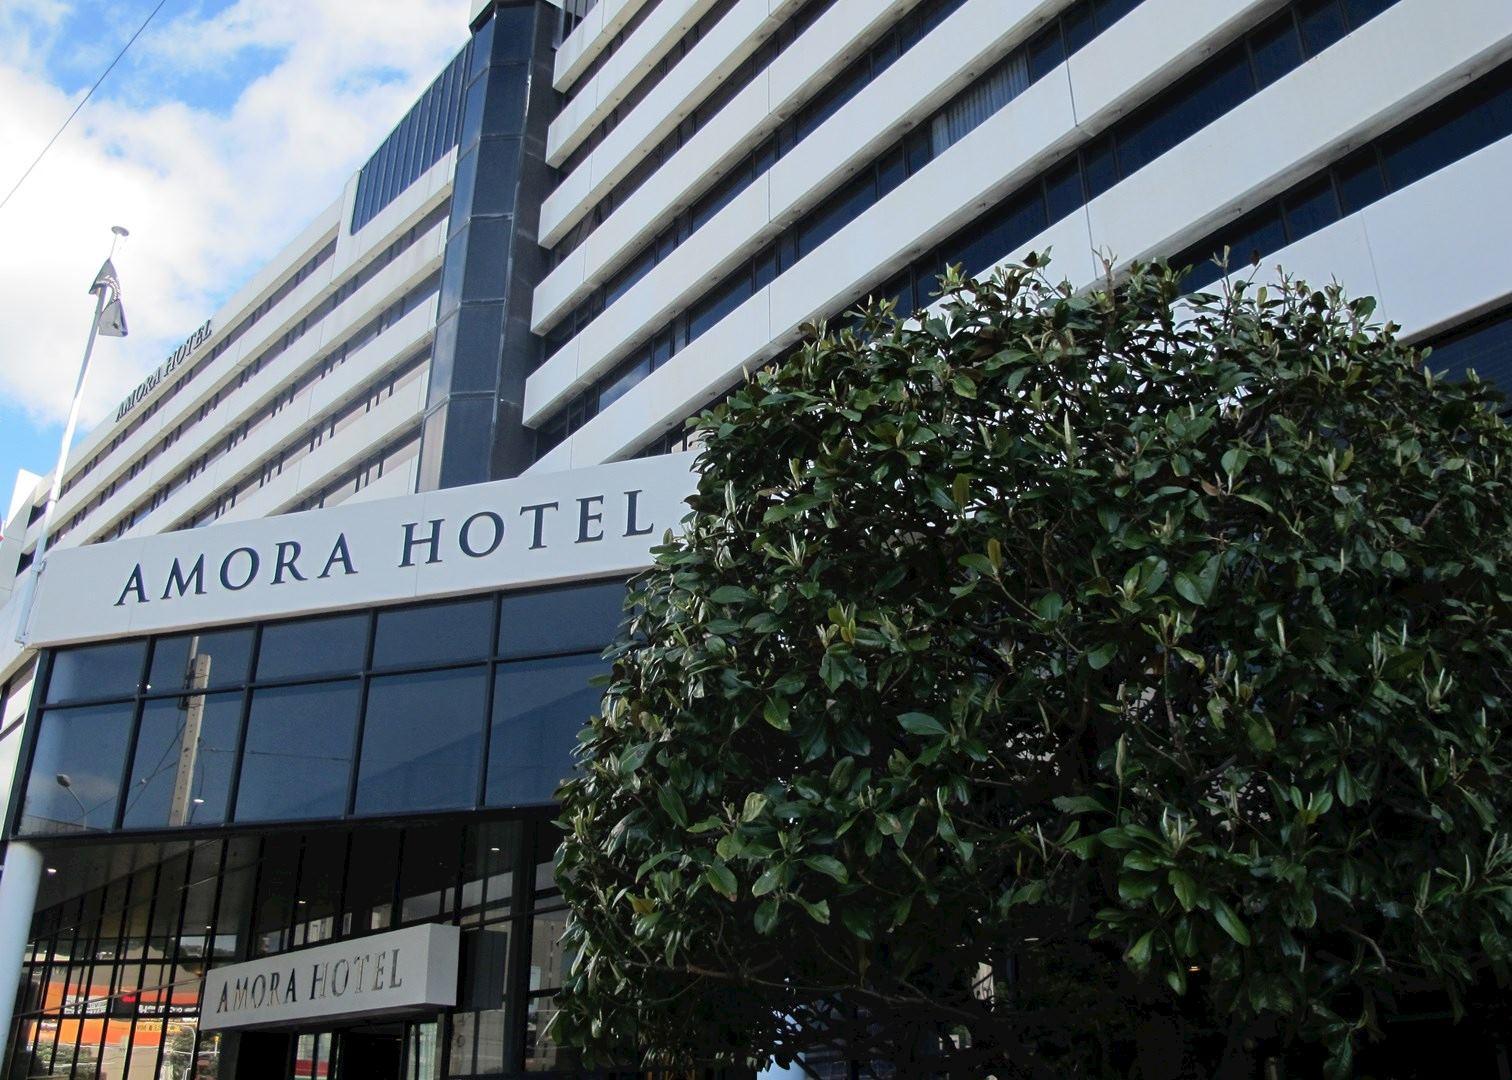 Amora Hotel New Zealand